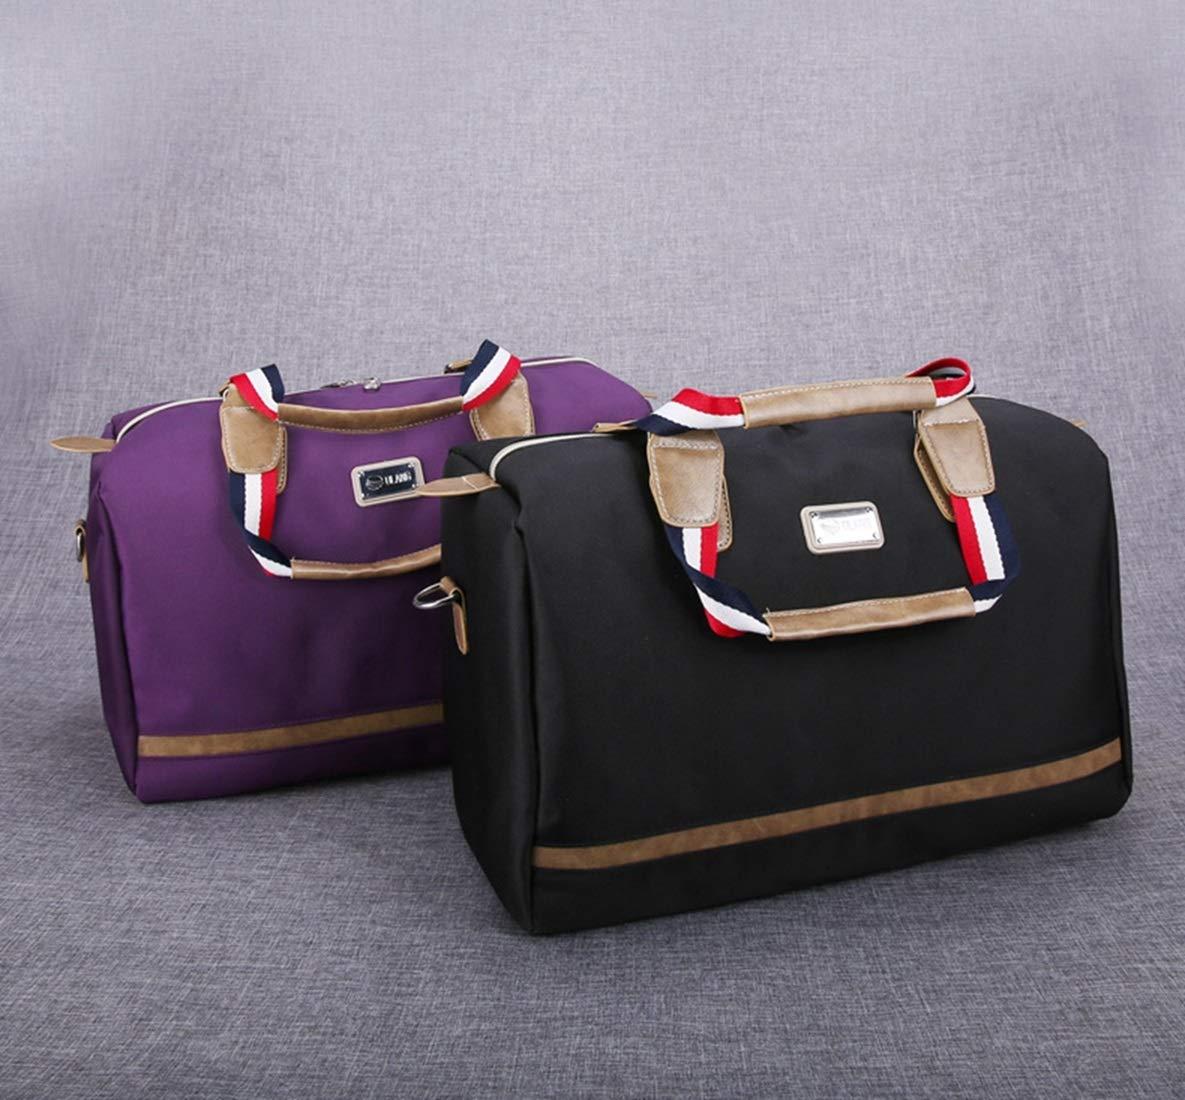 Color : Purple Carriemeow Hand Bag Male Large Capacity Waterproof Oxford Cloth Bag Luggage Bag Business Trip Package Ladies Travel Bag